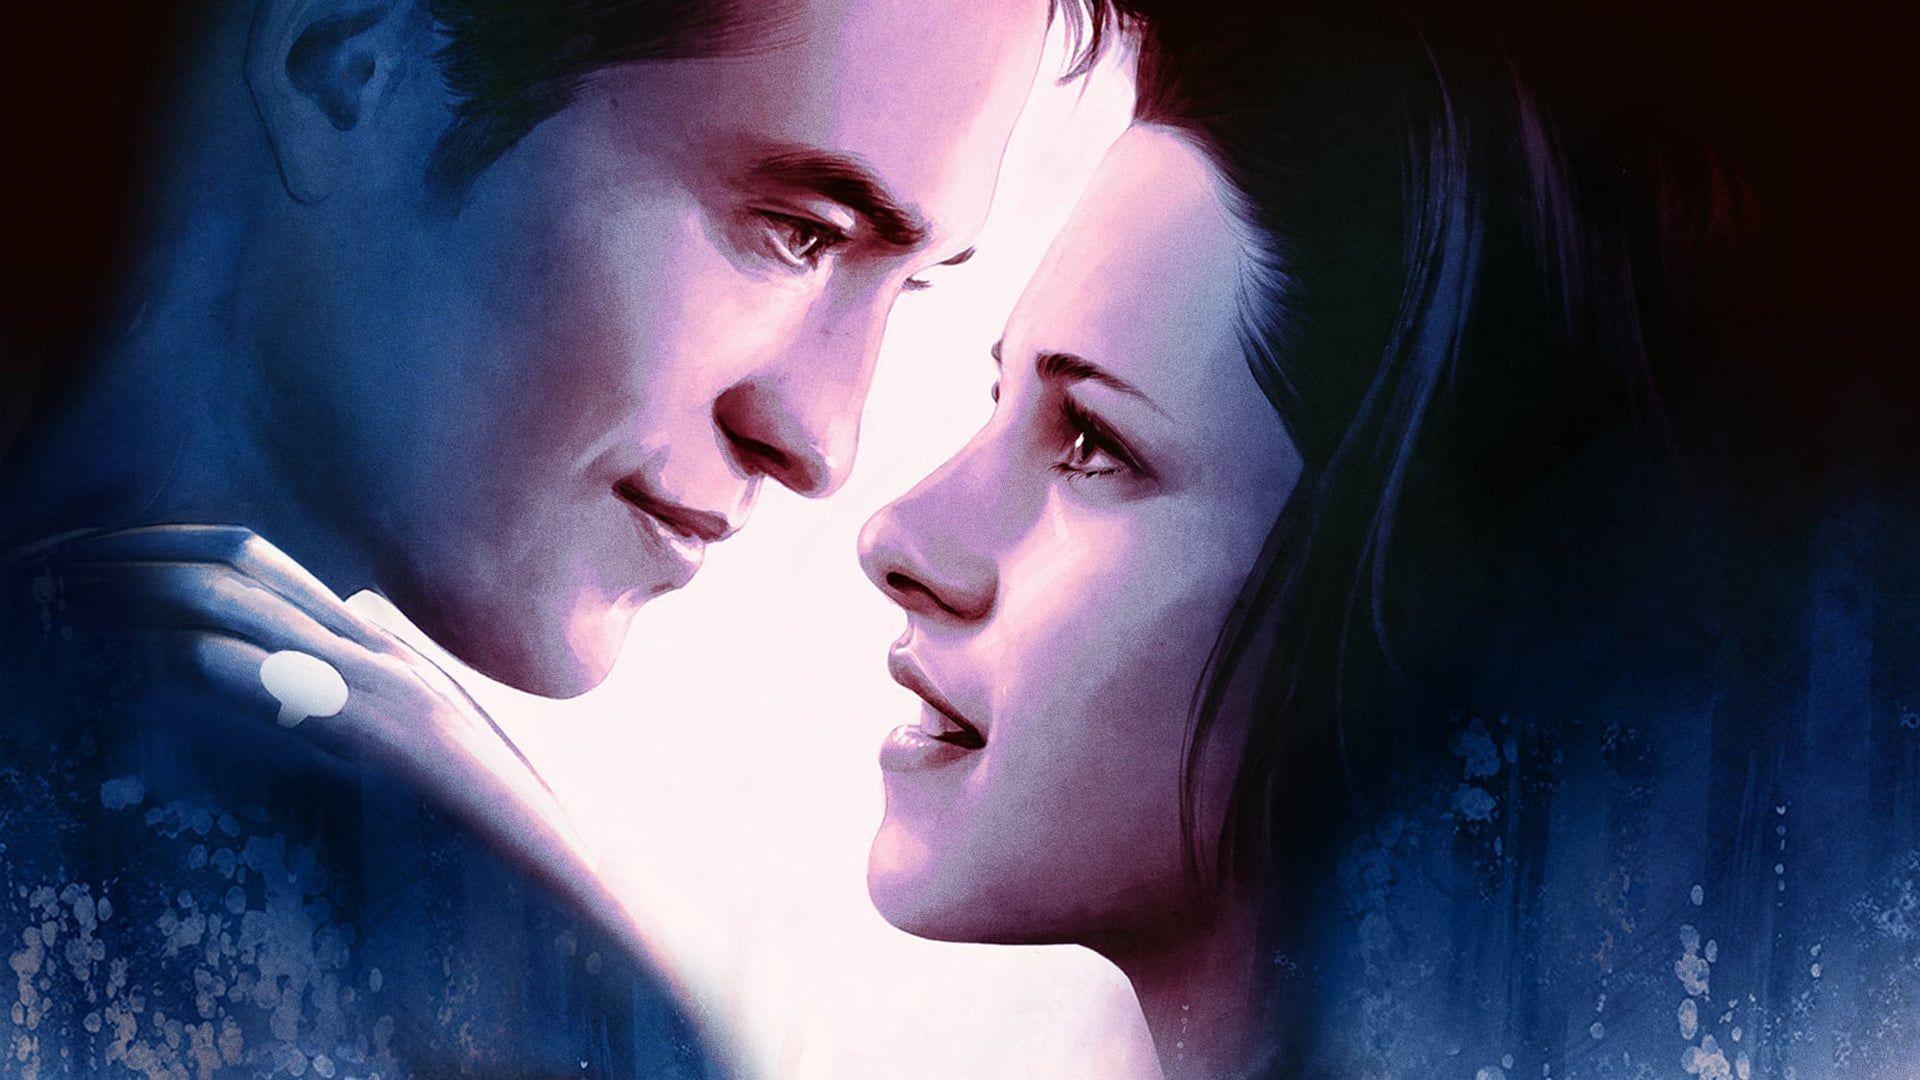 La Saga Crepusculo Amanecer Parte 1 2011 Putlocker Film